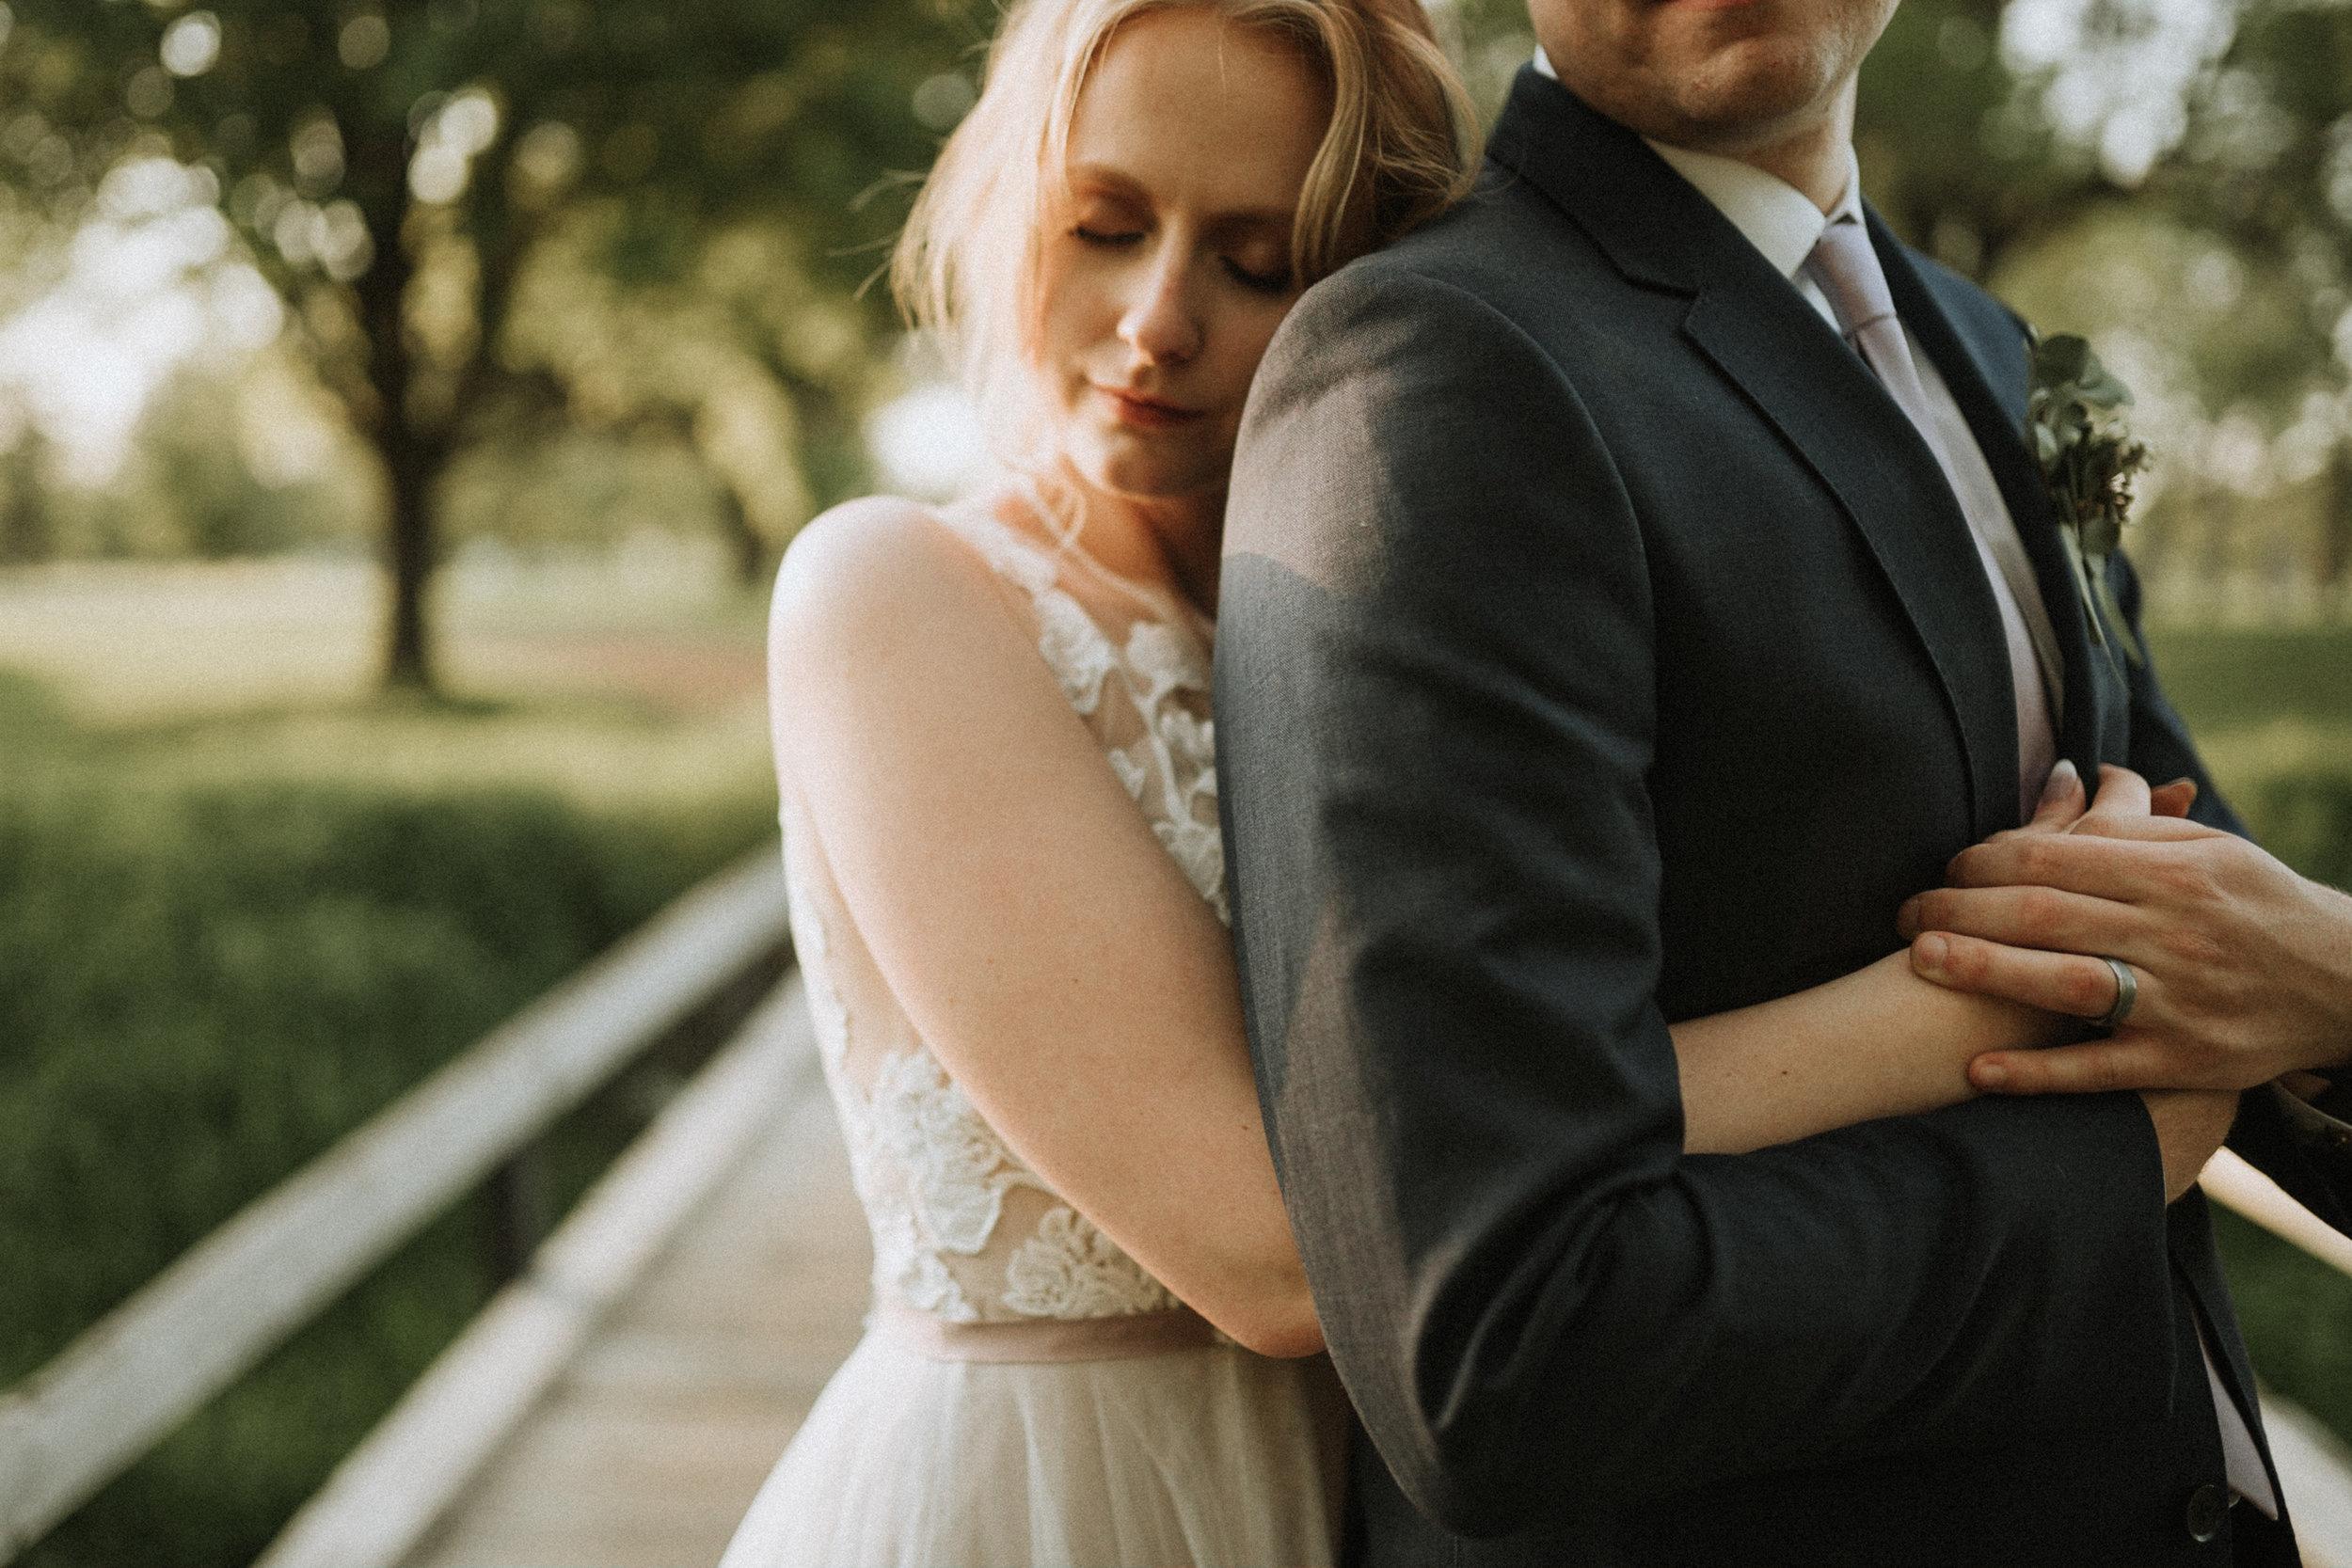 Wedding_(5_of_10).jpg